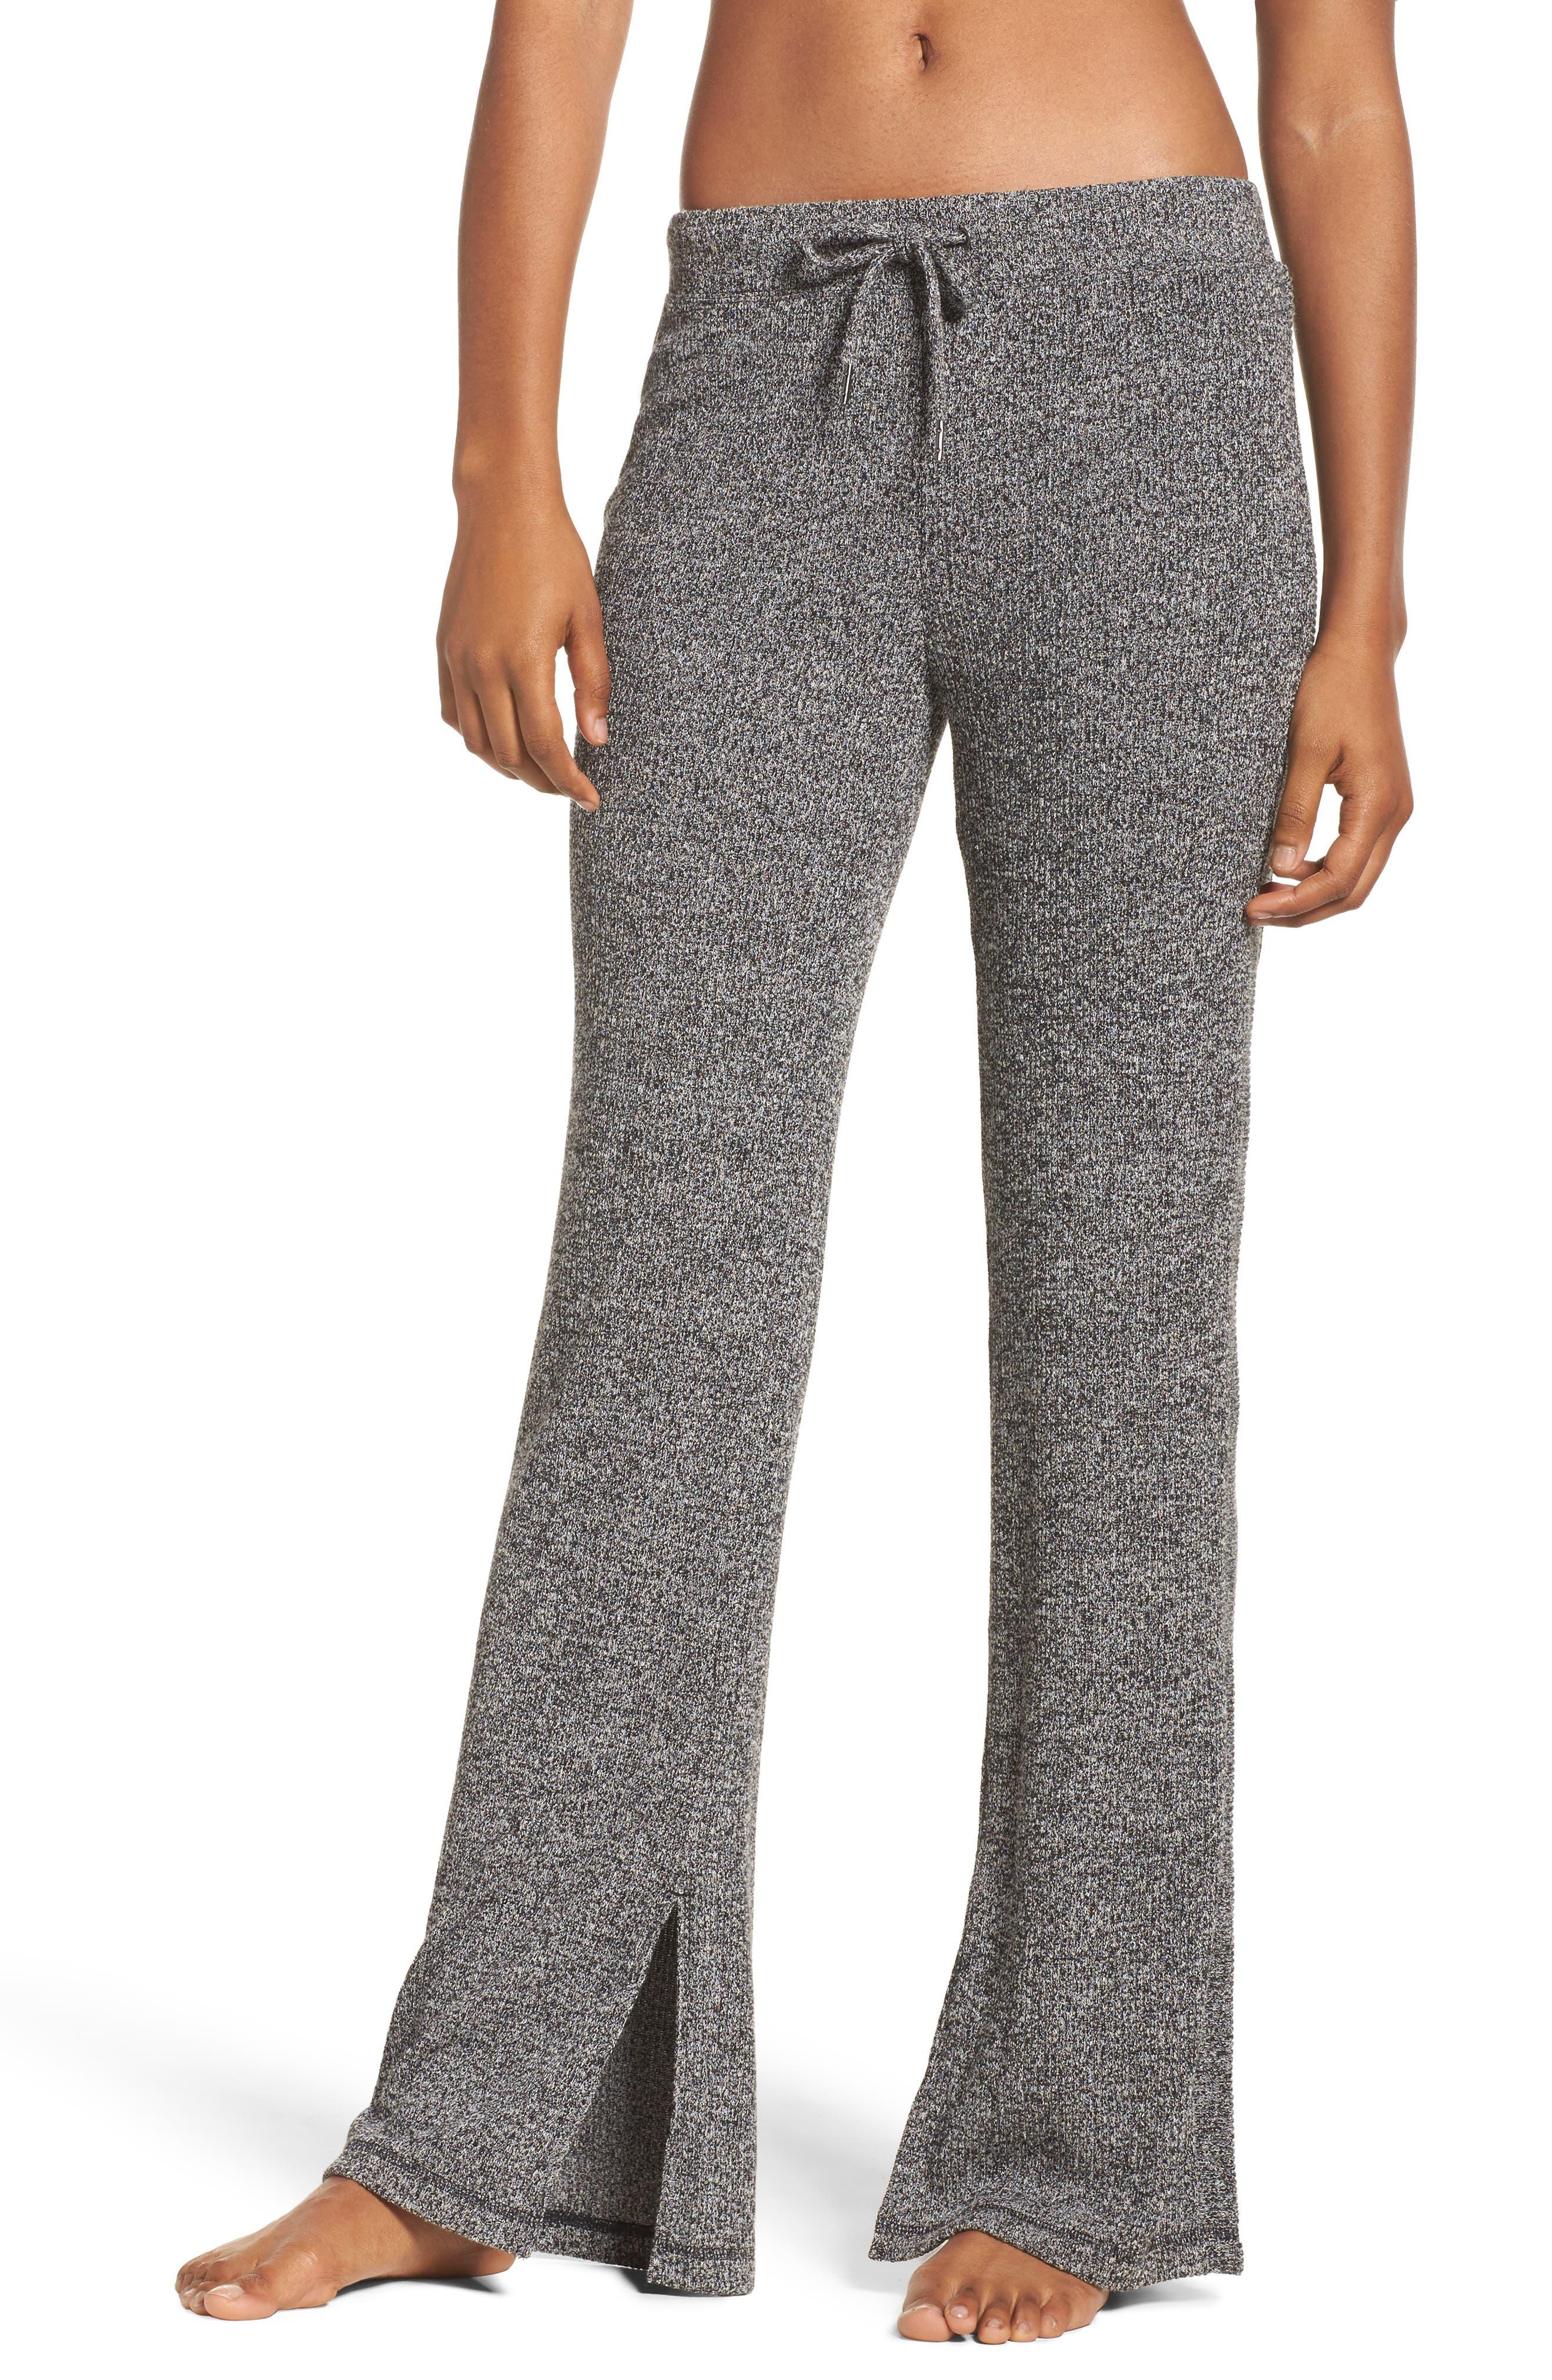 Alternate Image 1 Selected - Zella Mantra Ribbed Flare Pants